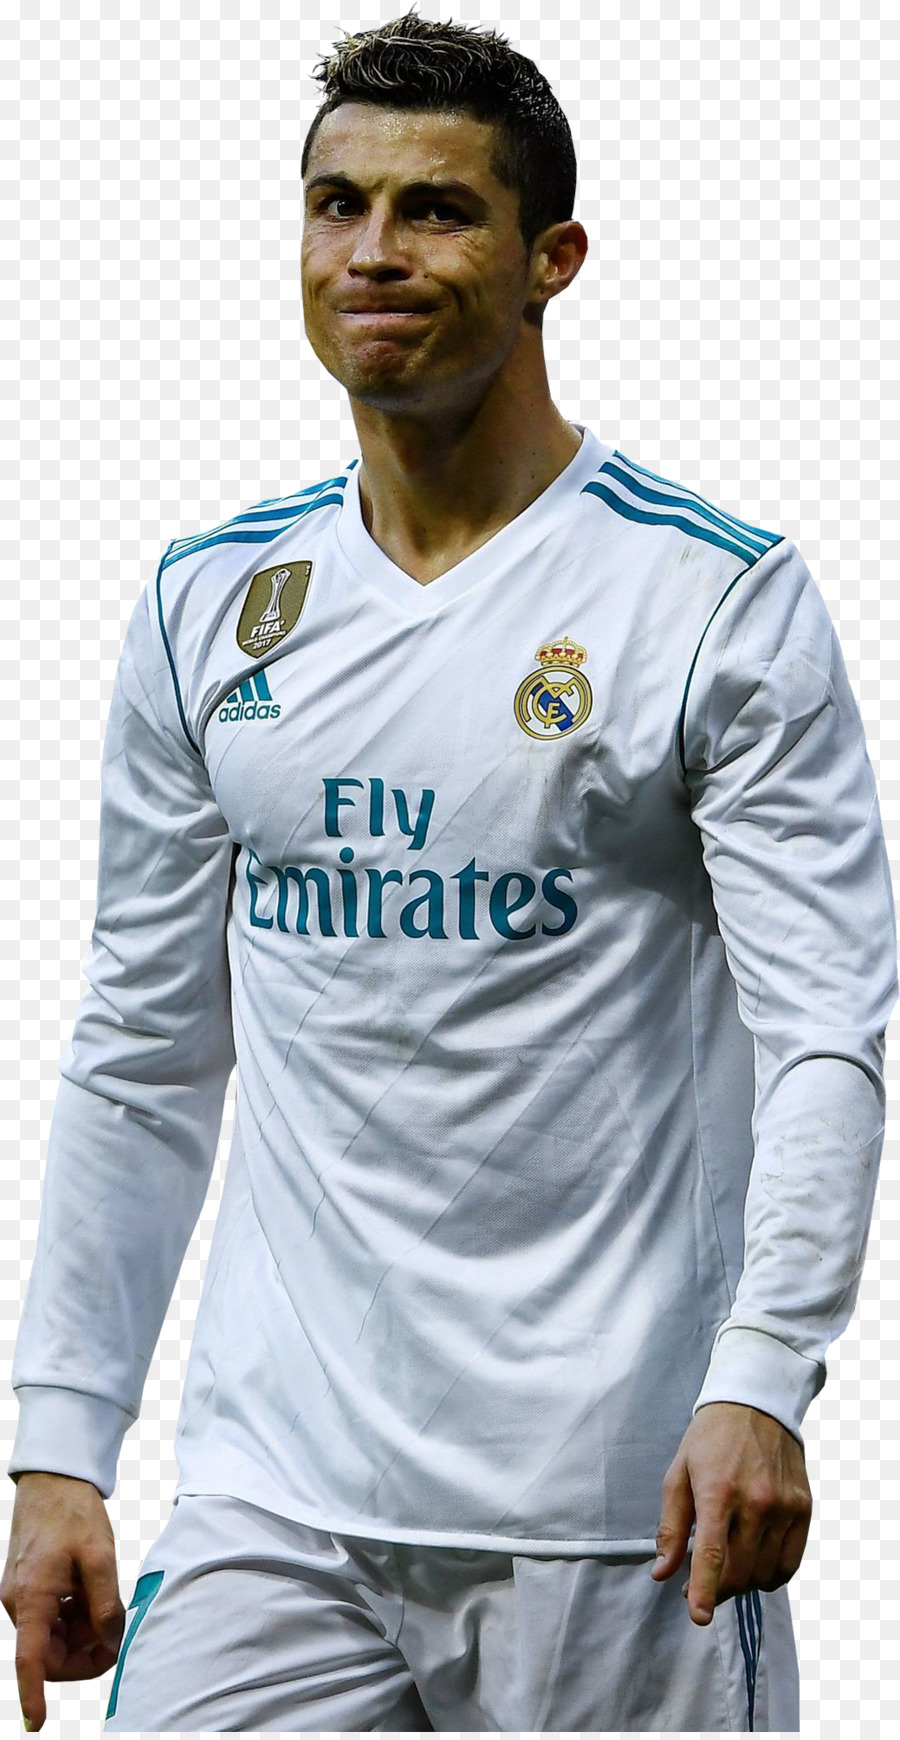 Cristiano Ronaldo clipart - Football, Clothing, Tshirt, transparent clip art